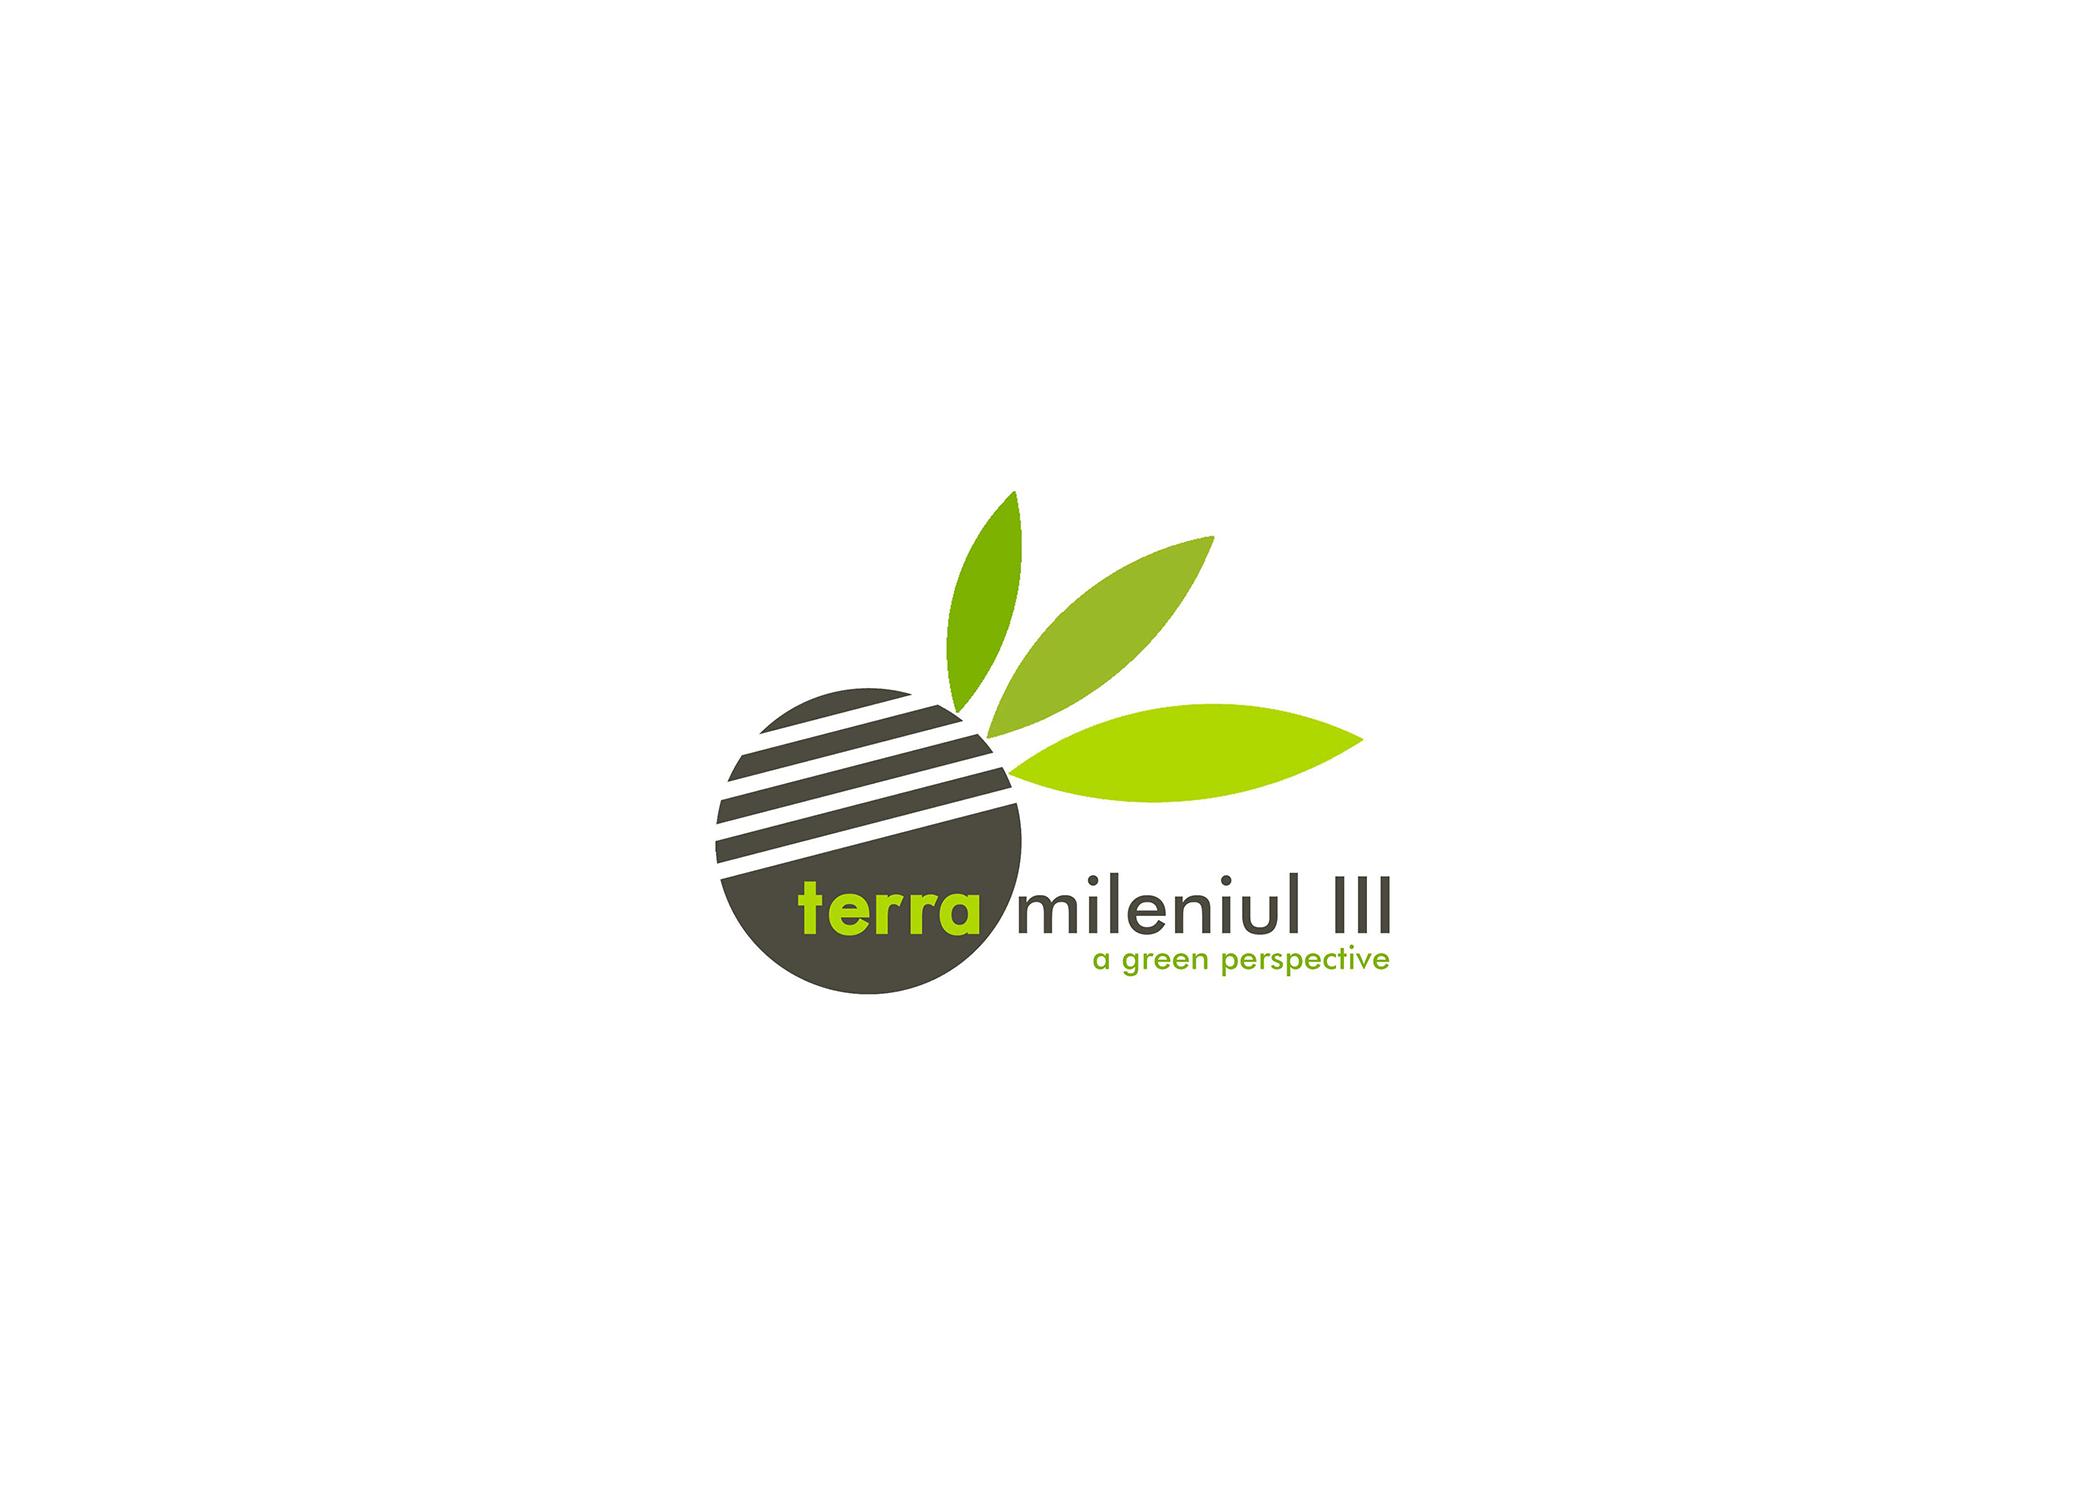 terra mileniul